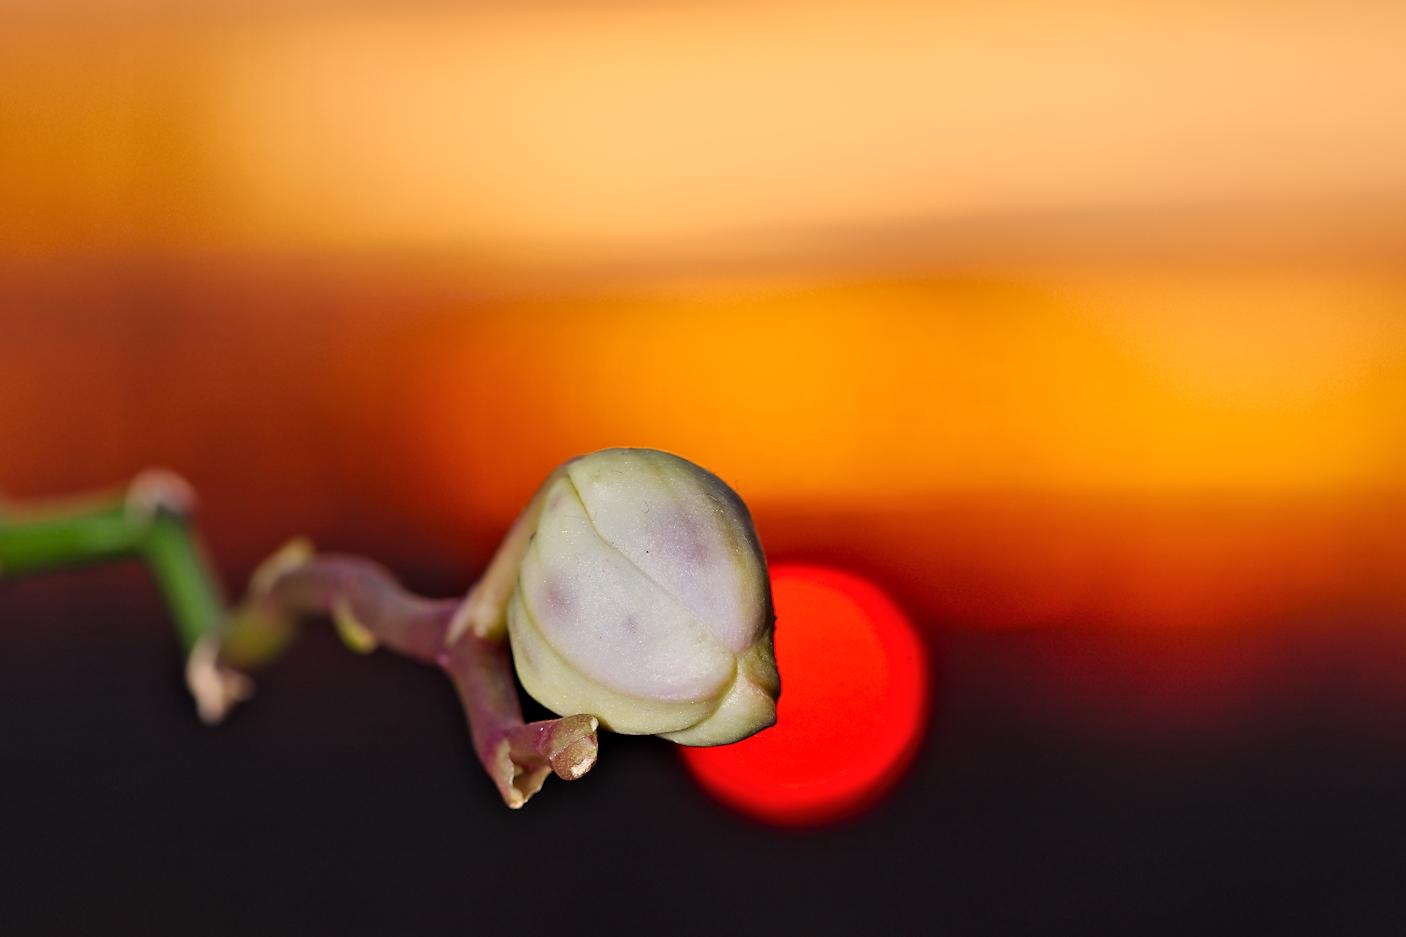 ... At sunset...